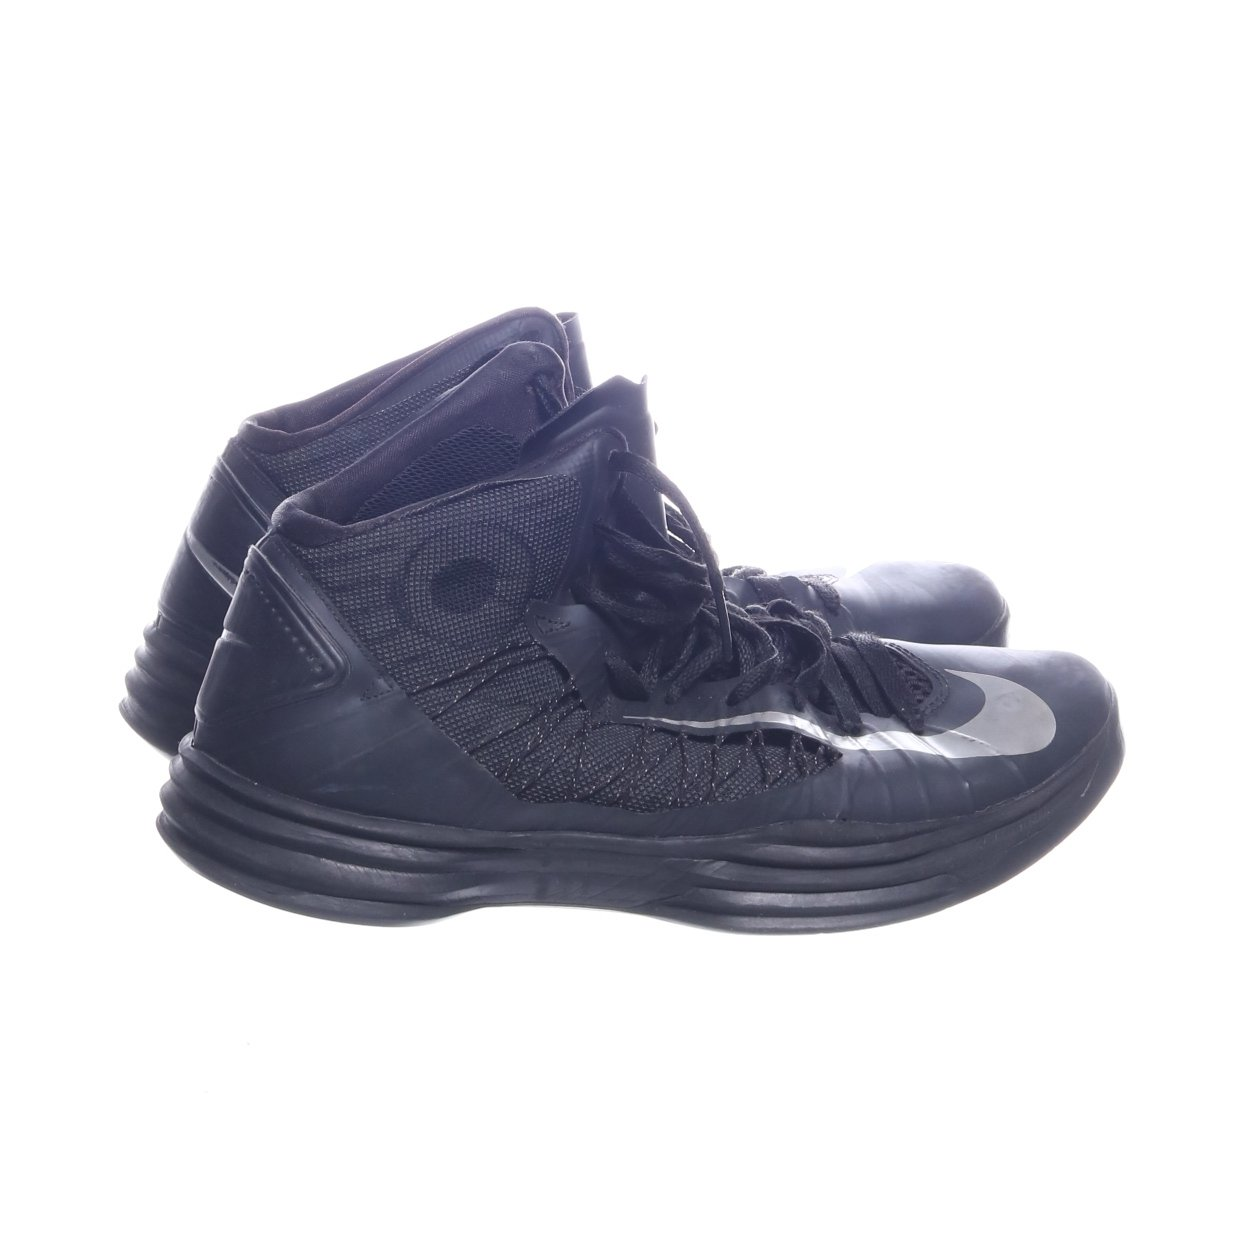 newest 9af1e ca76c Nike, Sneakers, Strl  44.5, Svart Grå